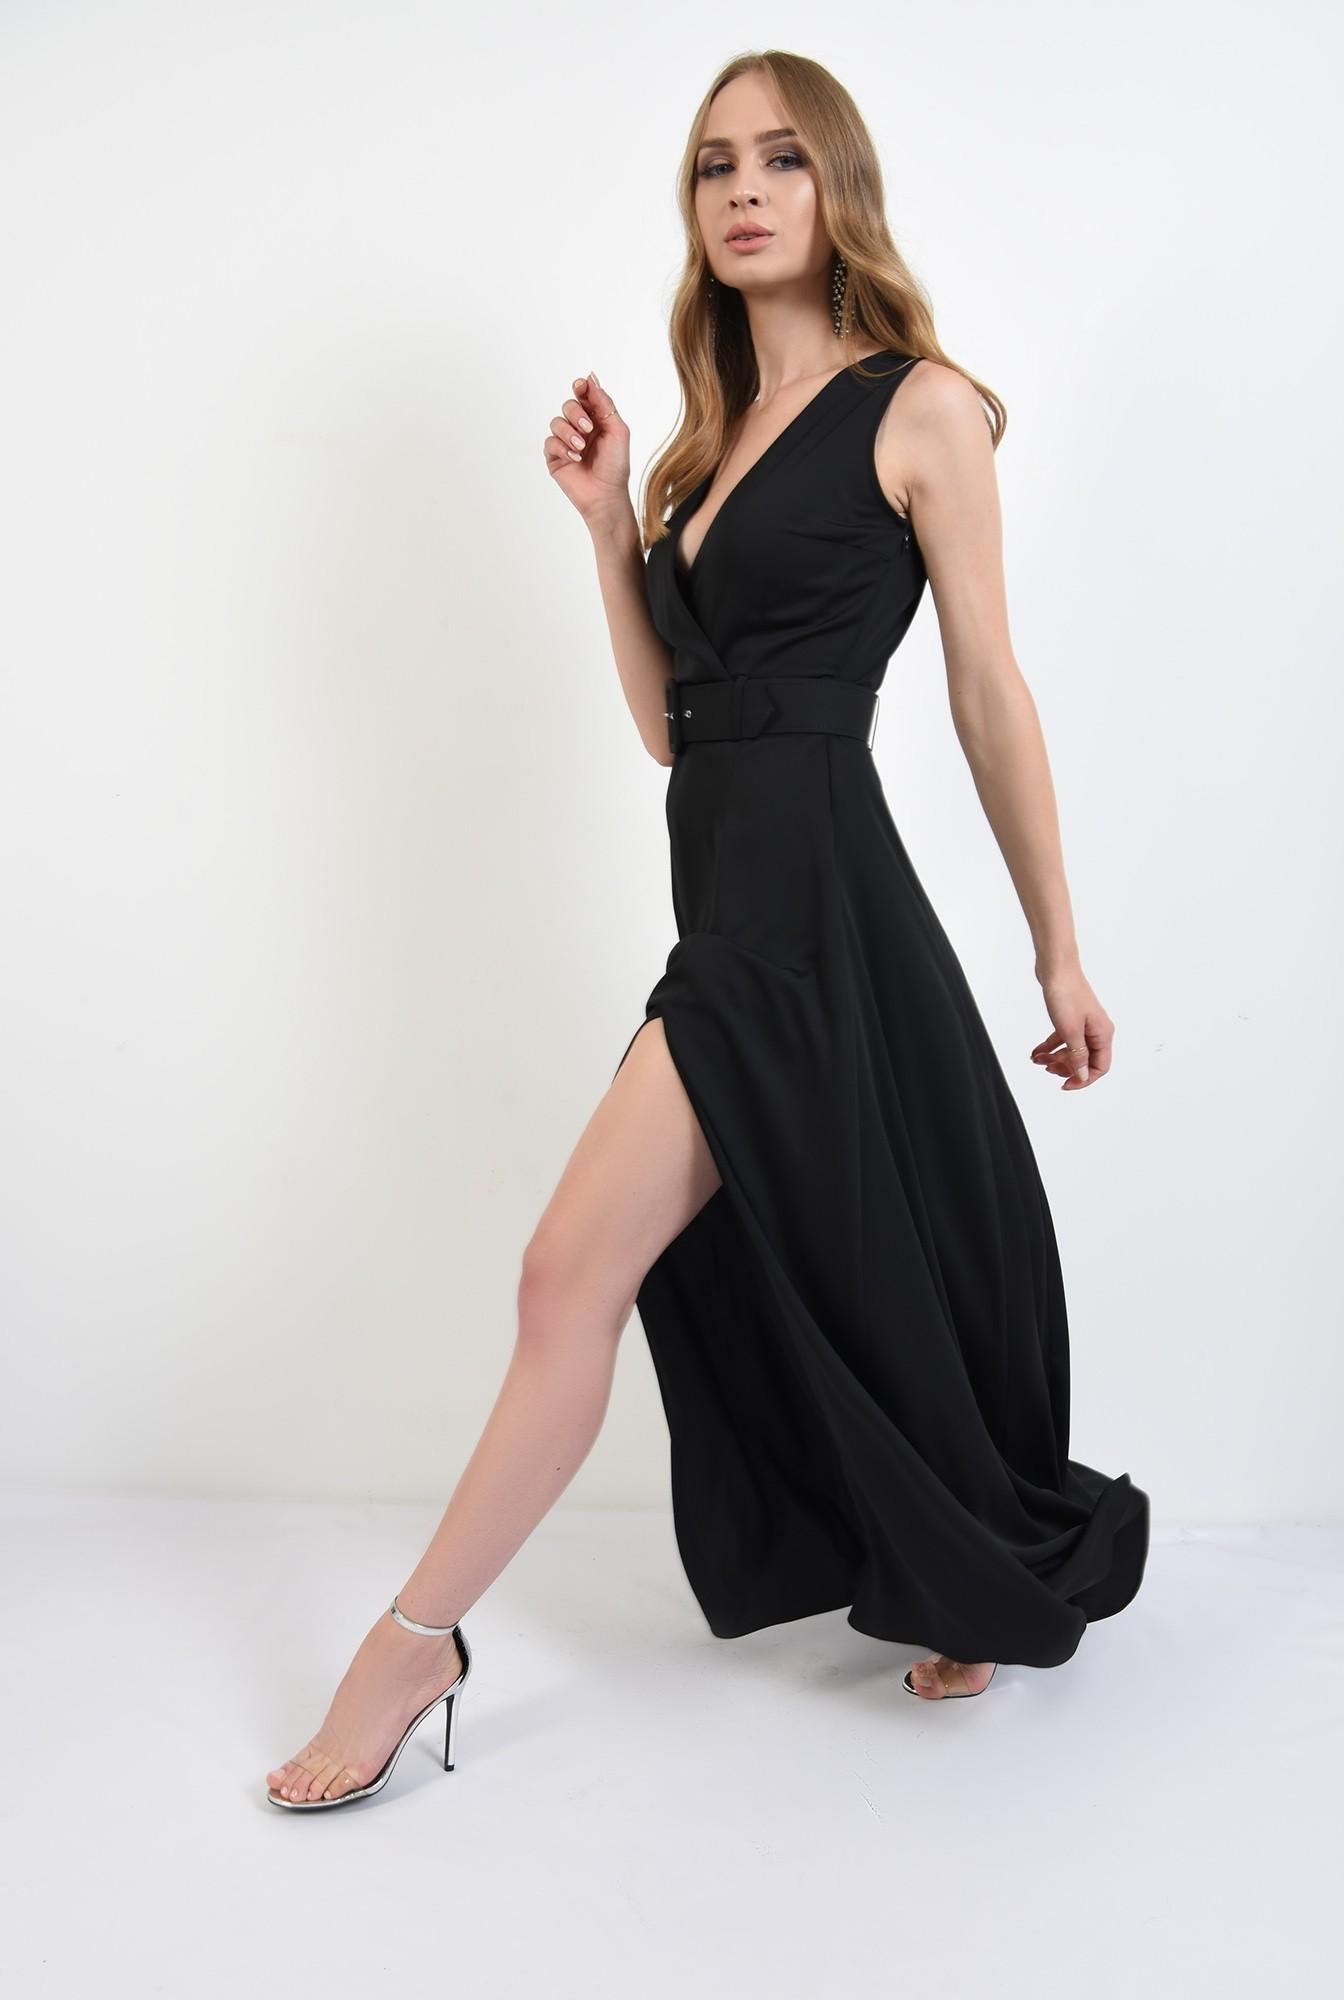 3 - 360 - rochie lunga, neagra, cu centura, Poema